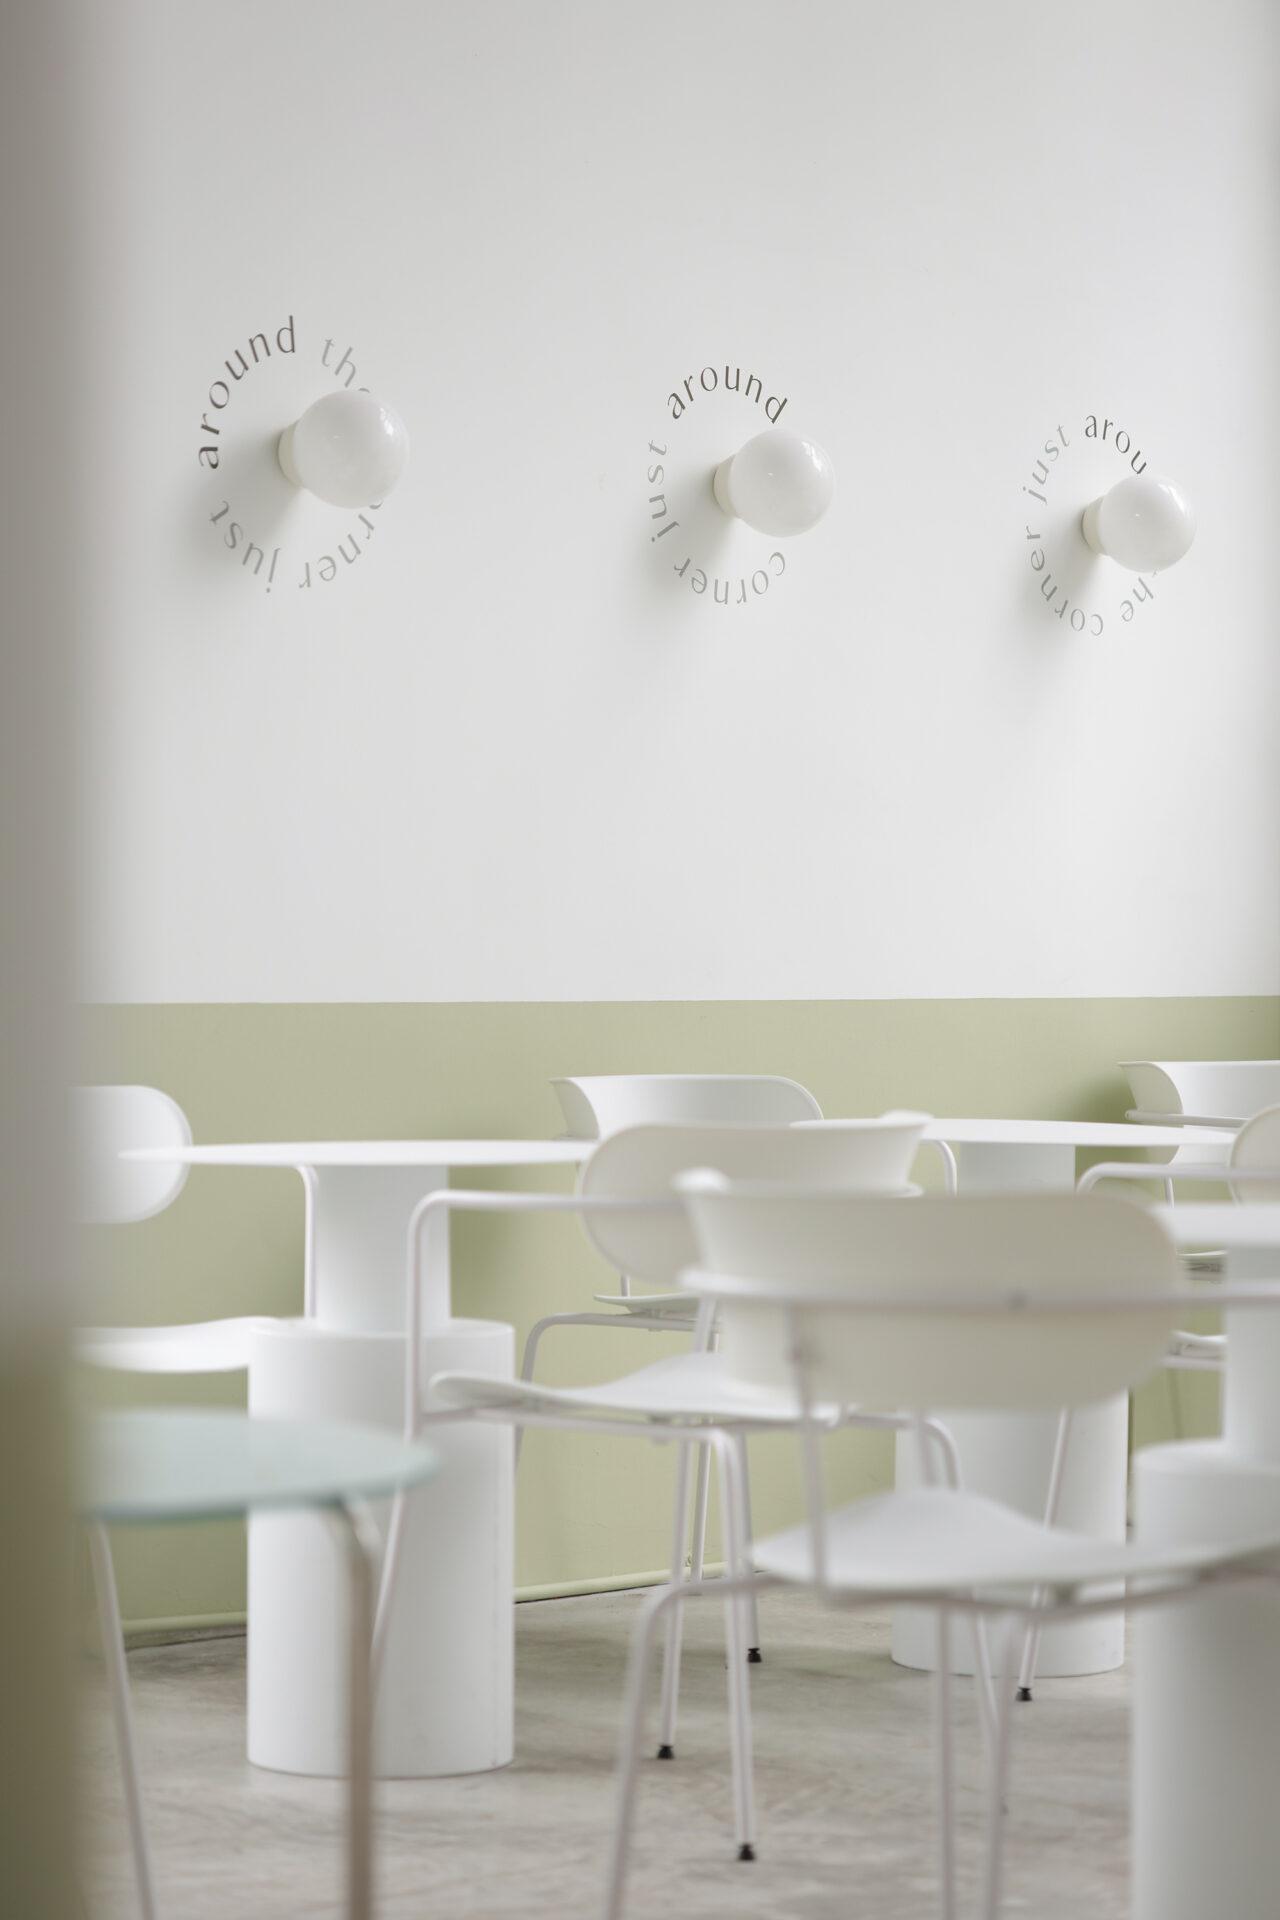 ascend design ice cream waffles cafe interior 2